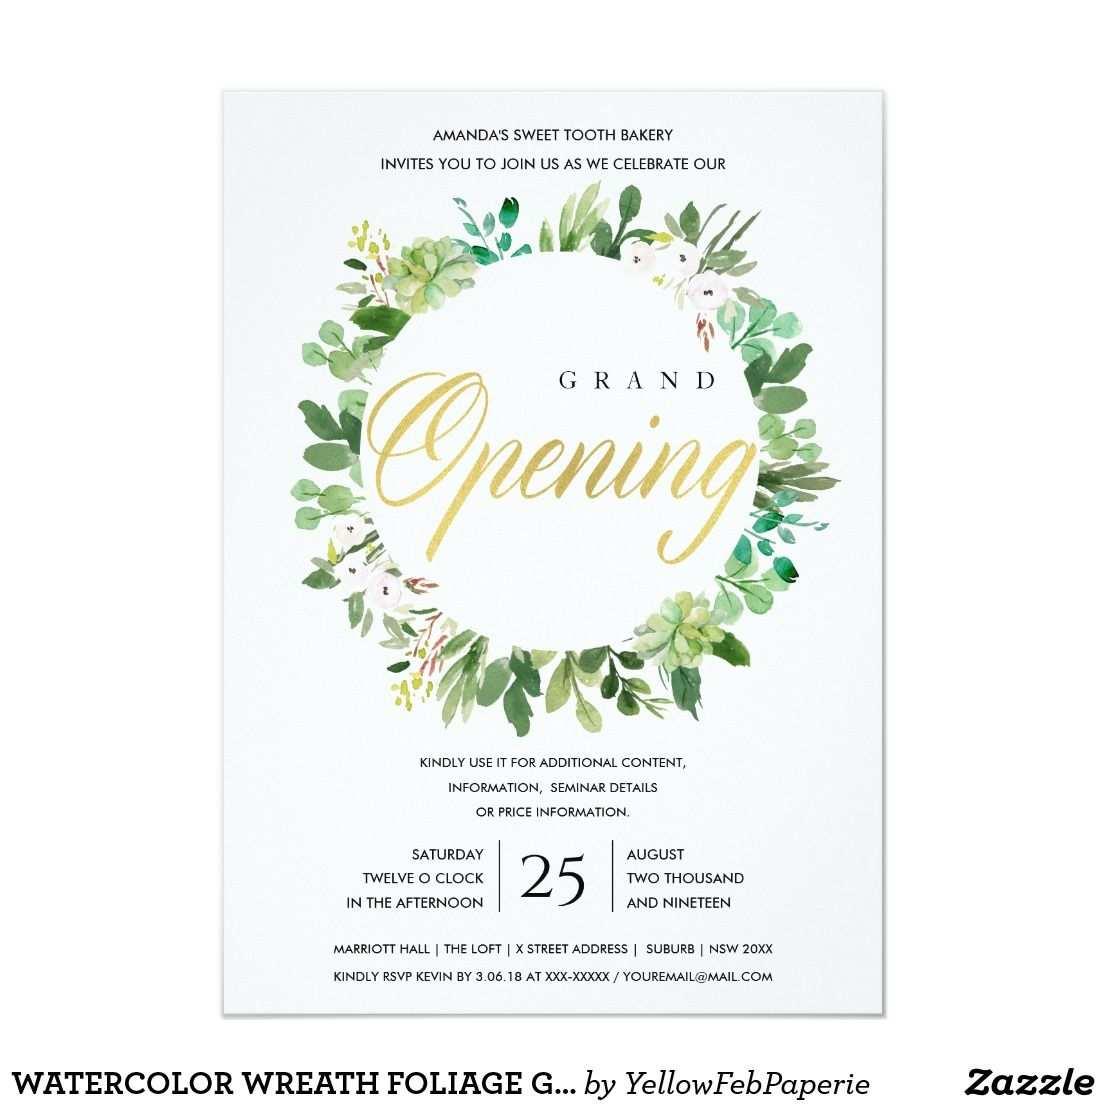 Watercolor Wreath Foliage Grand Opening Ceremony Invitation